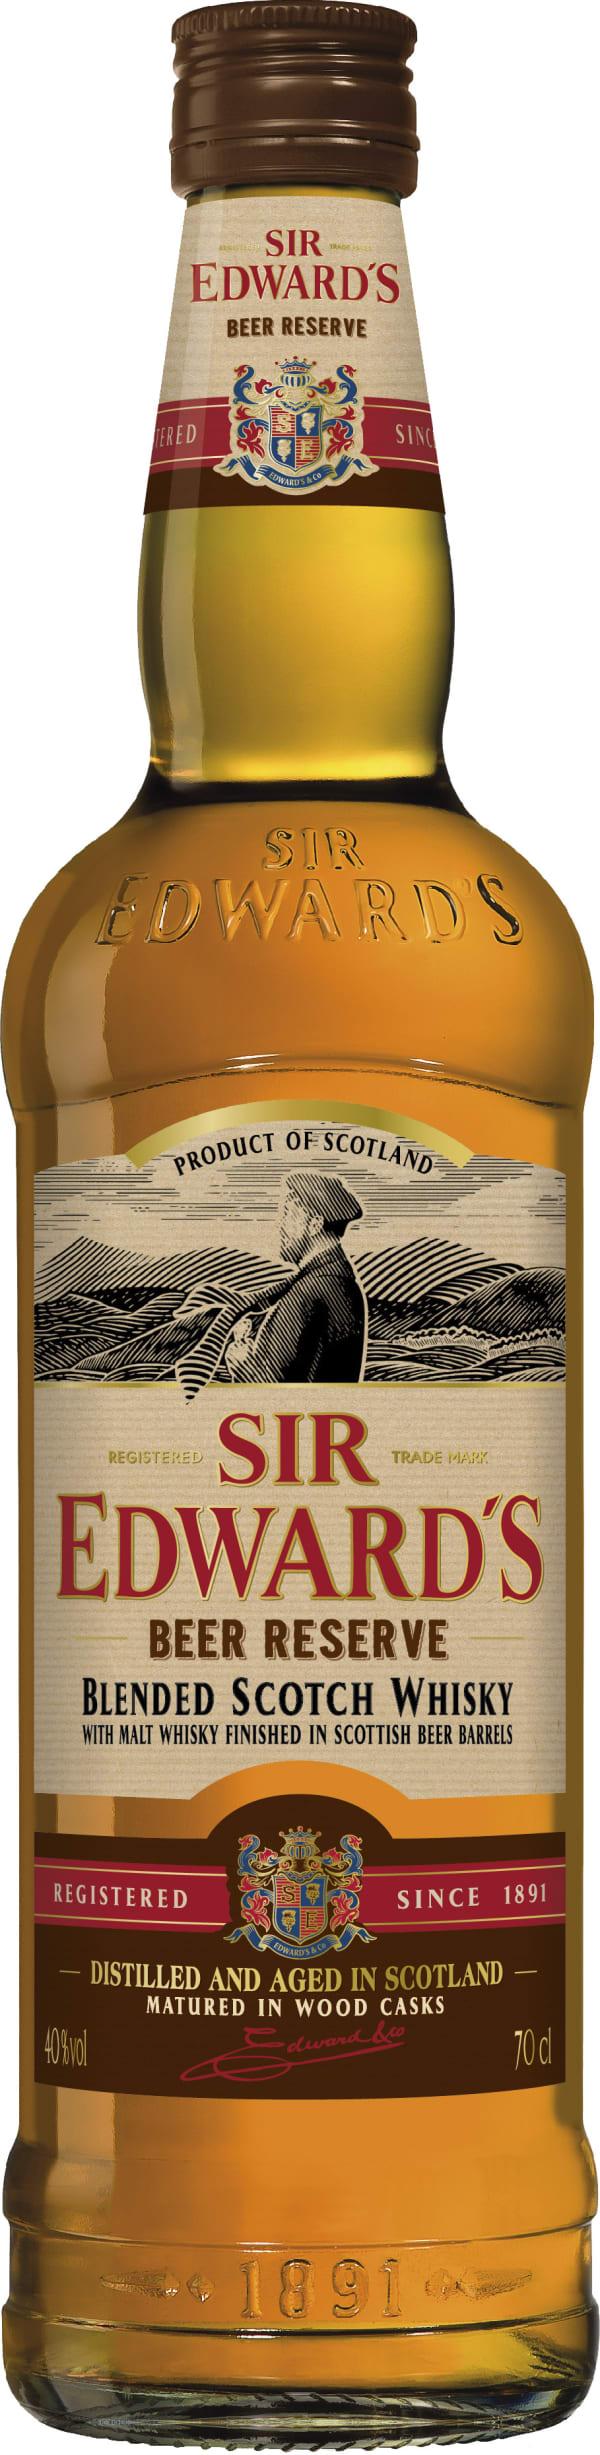 Sir Edward's Beer Reserve